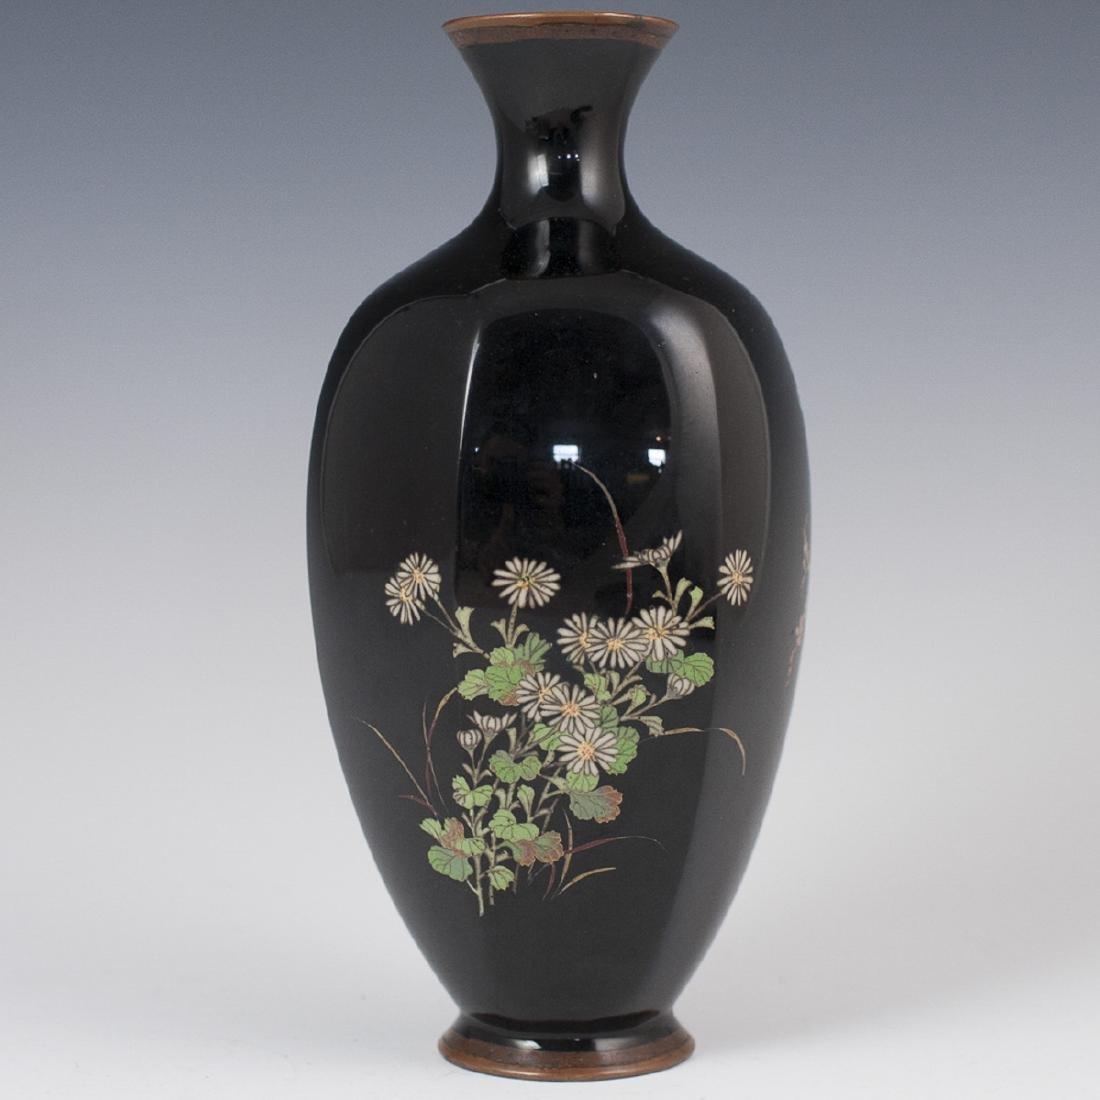 Japanese Meiji Cloisonne Enameled Vase